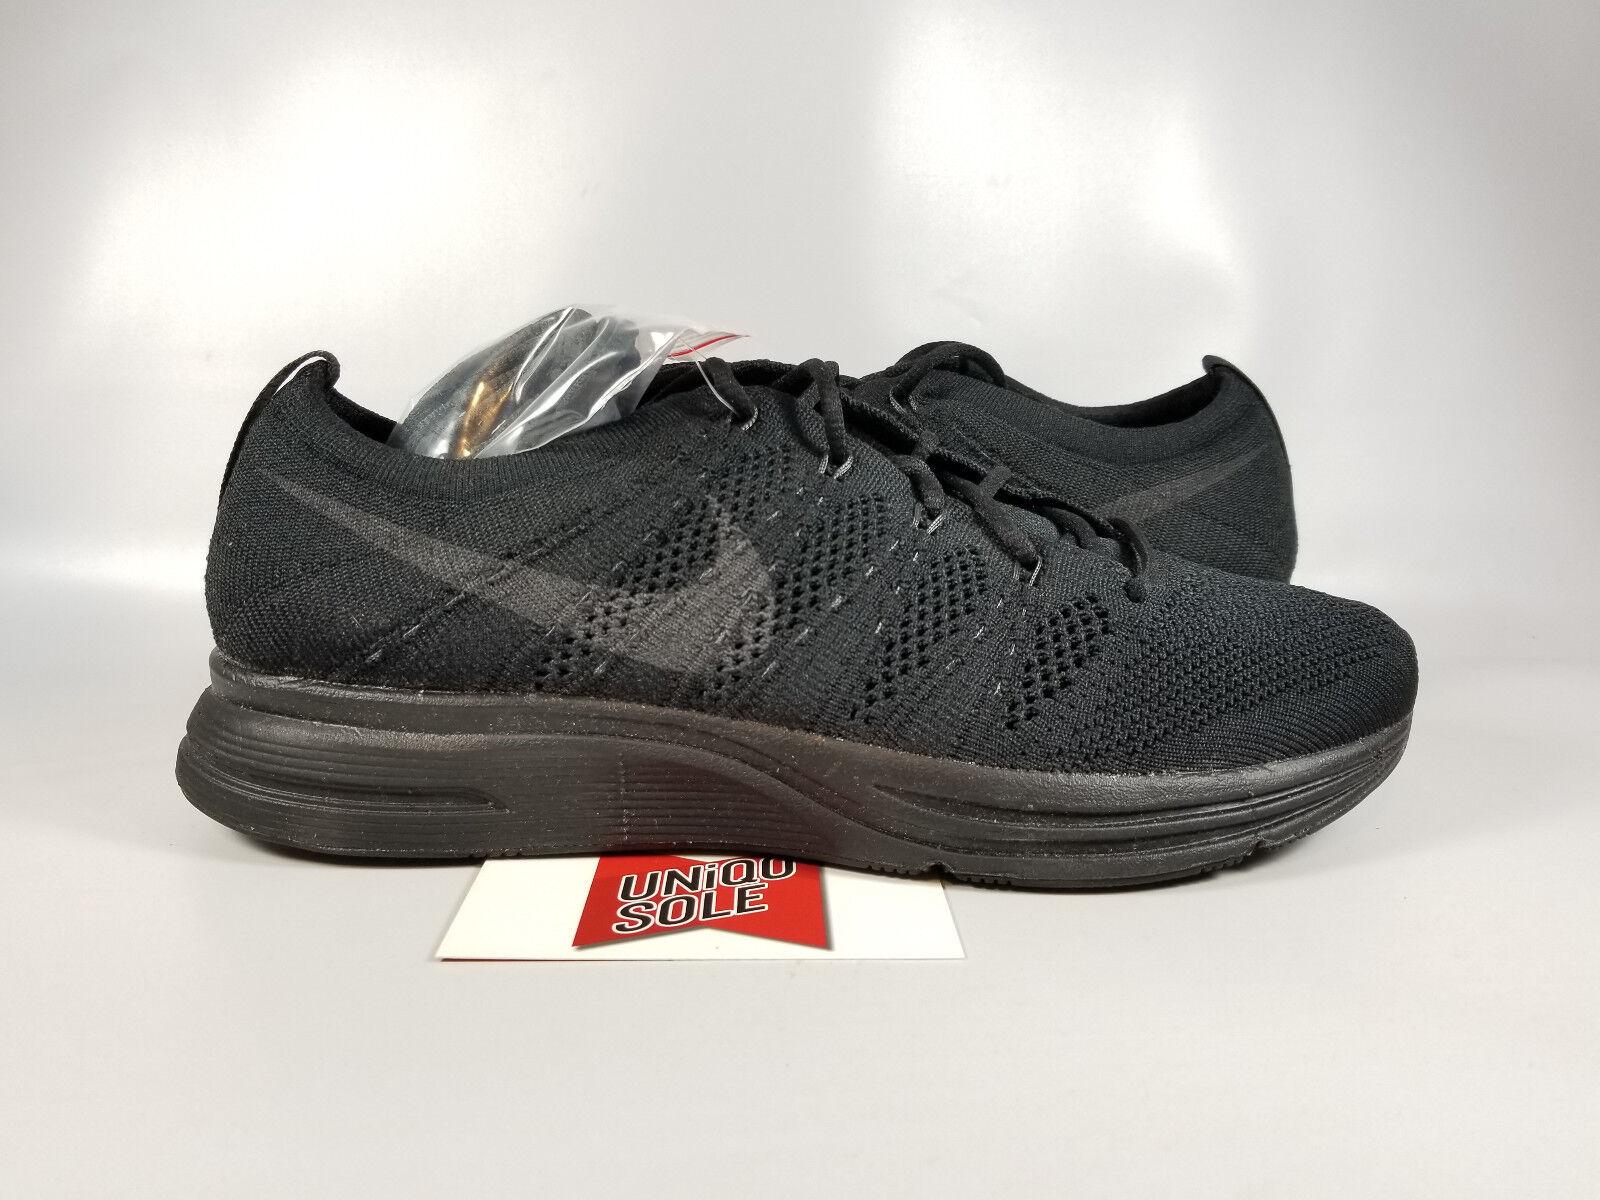 online store 33154 32db3 Nike flyknit trainer triplo nero nero nero neroout ah8396-004 10,5 correndo  racer